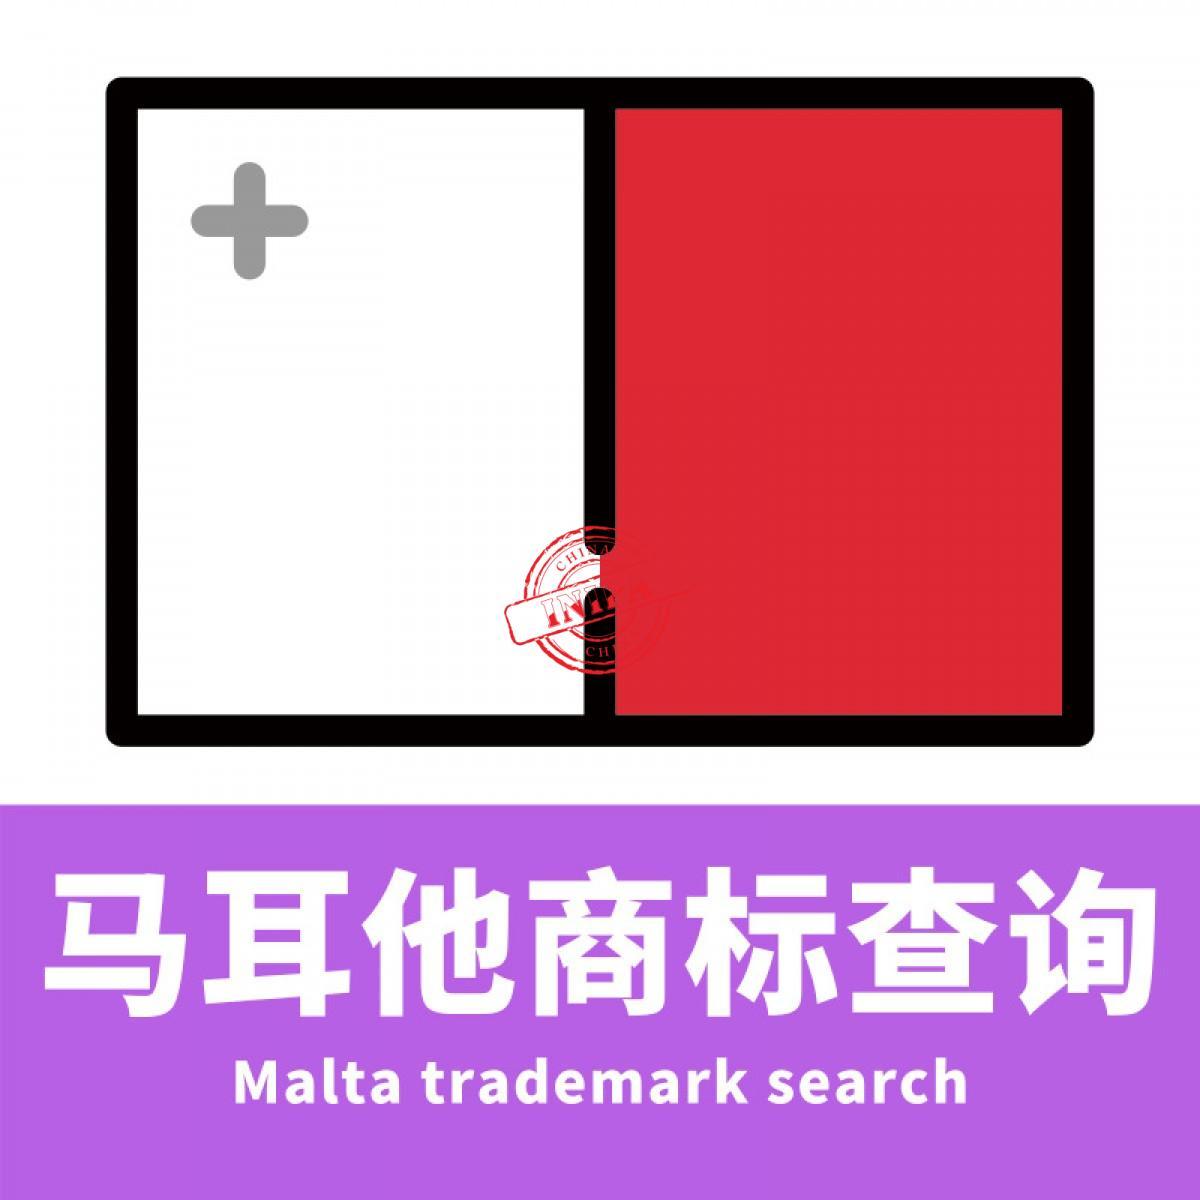 马耳他商标查询/Malta trademark search